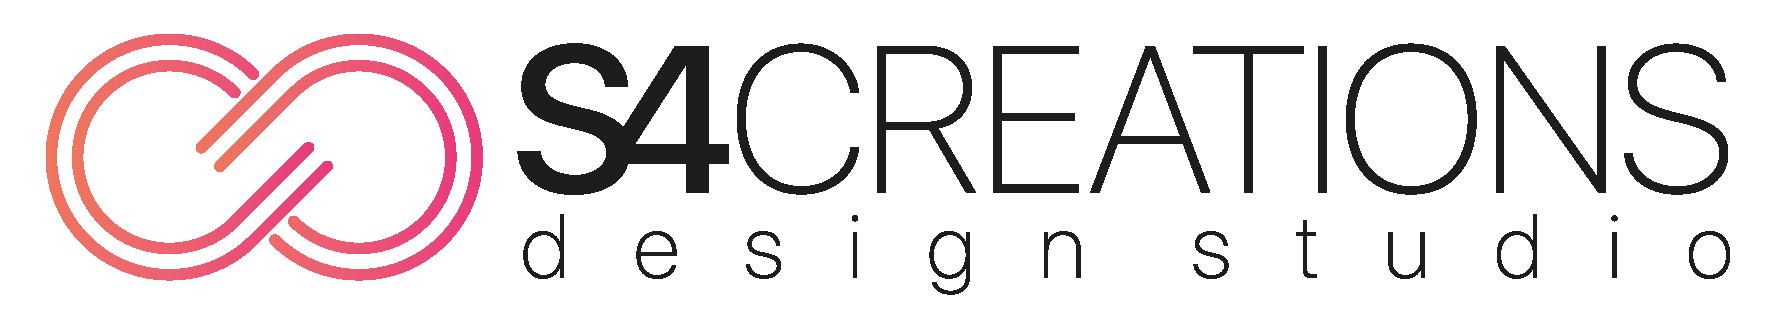 logo3-2018